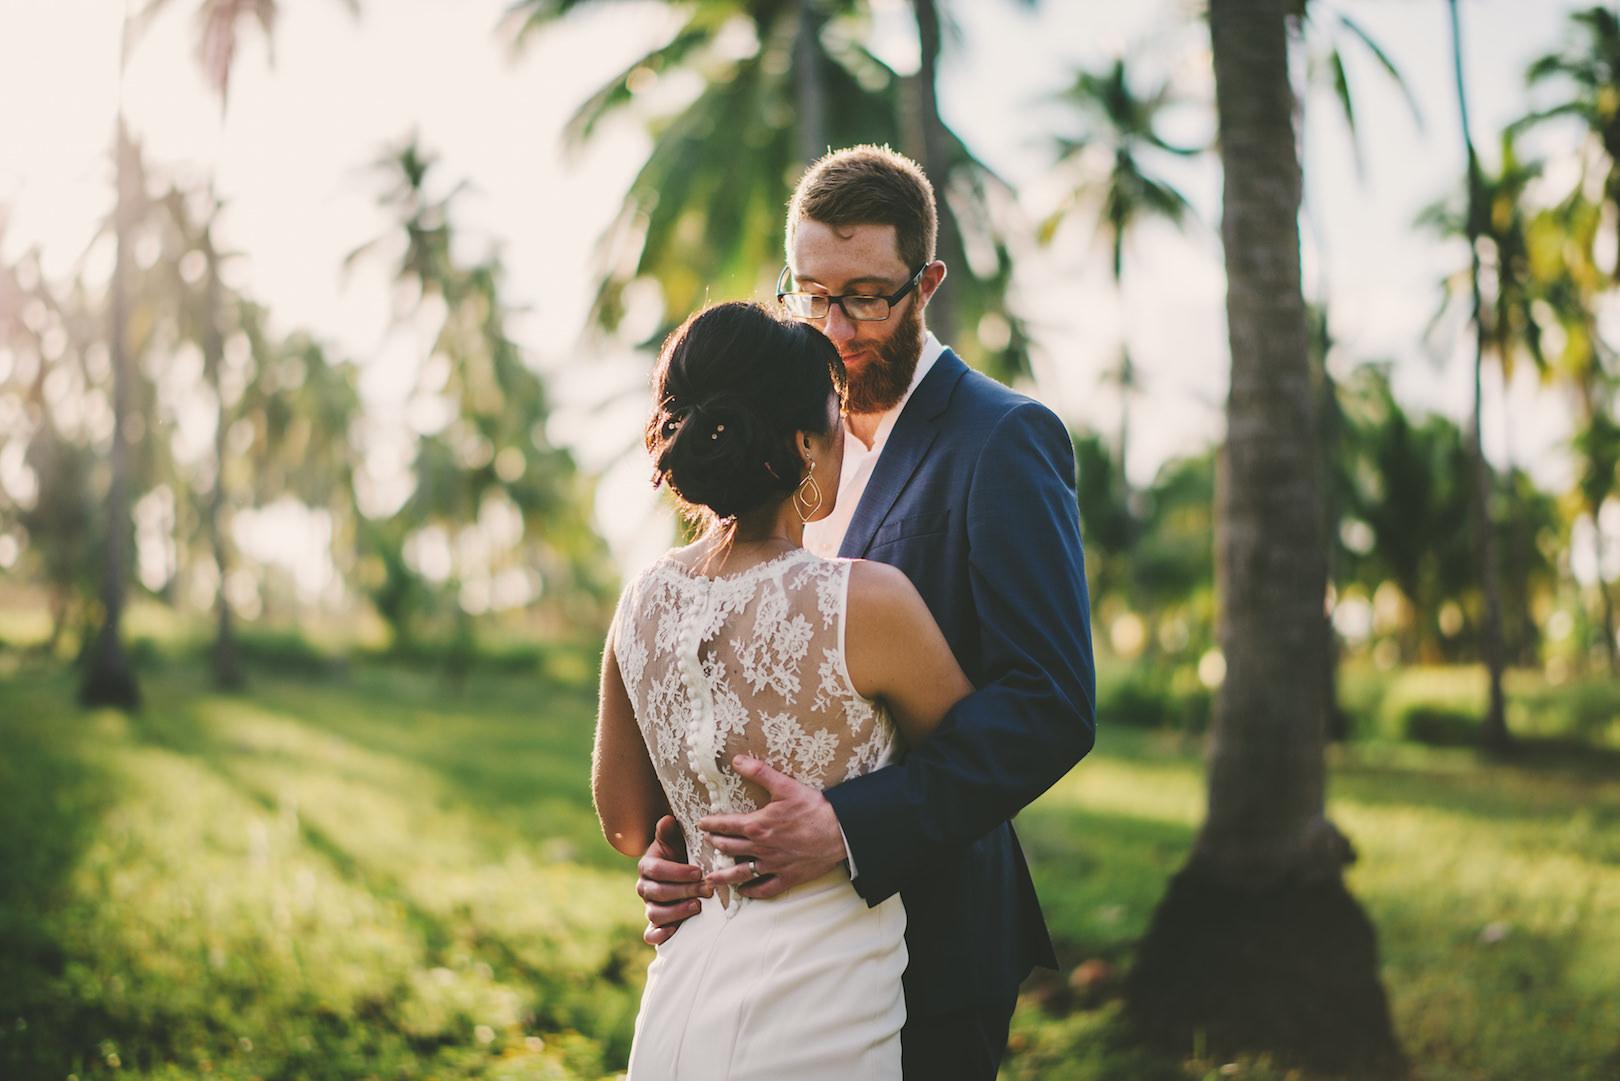 Nathan & Felicia - Wedding Day - © Dallas Kolotylo Photography - 476